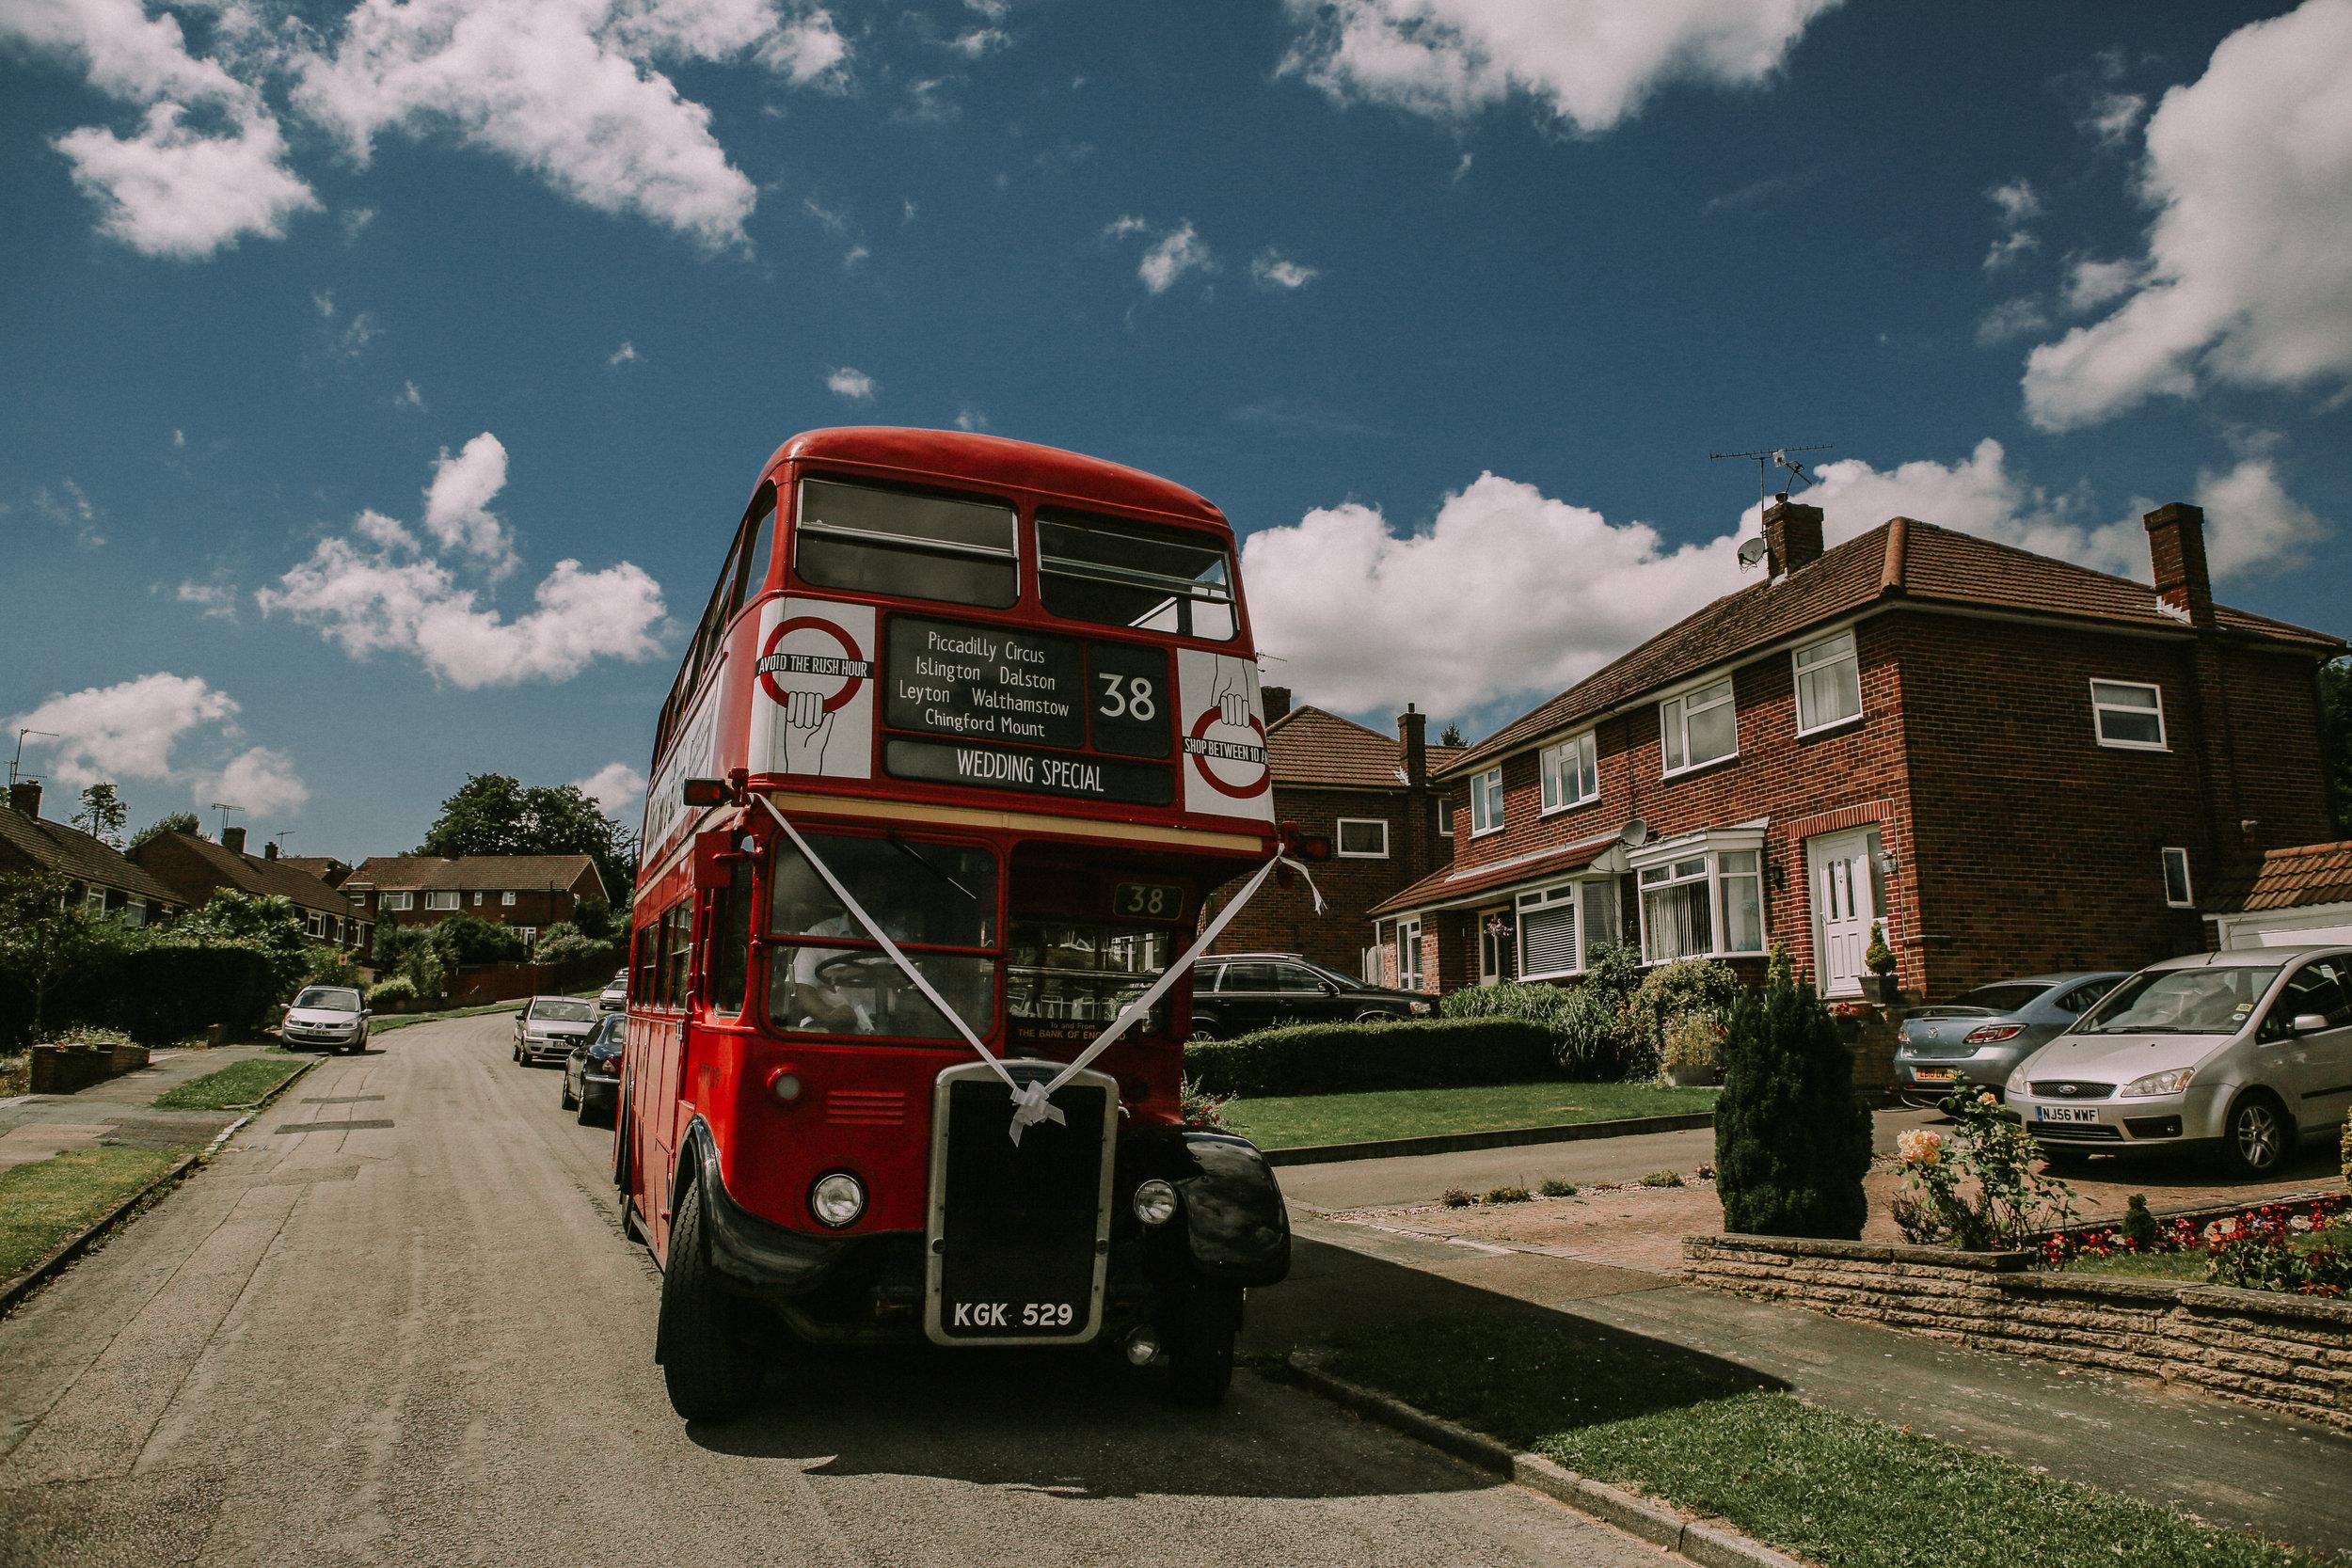 reigate-surrey-london-wedding-photography-bridal-prep-routemaster-bus-20